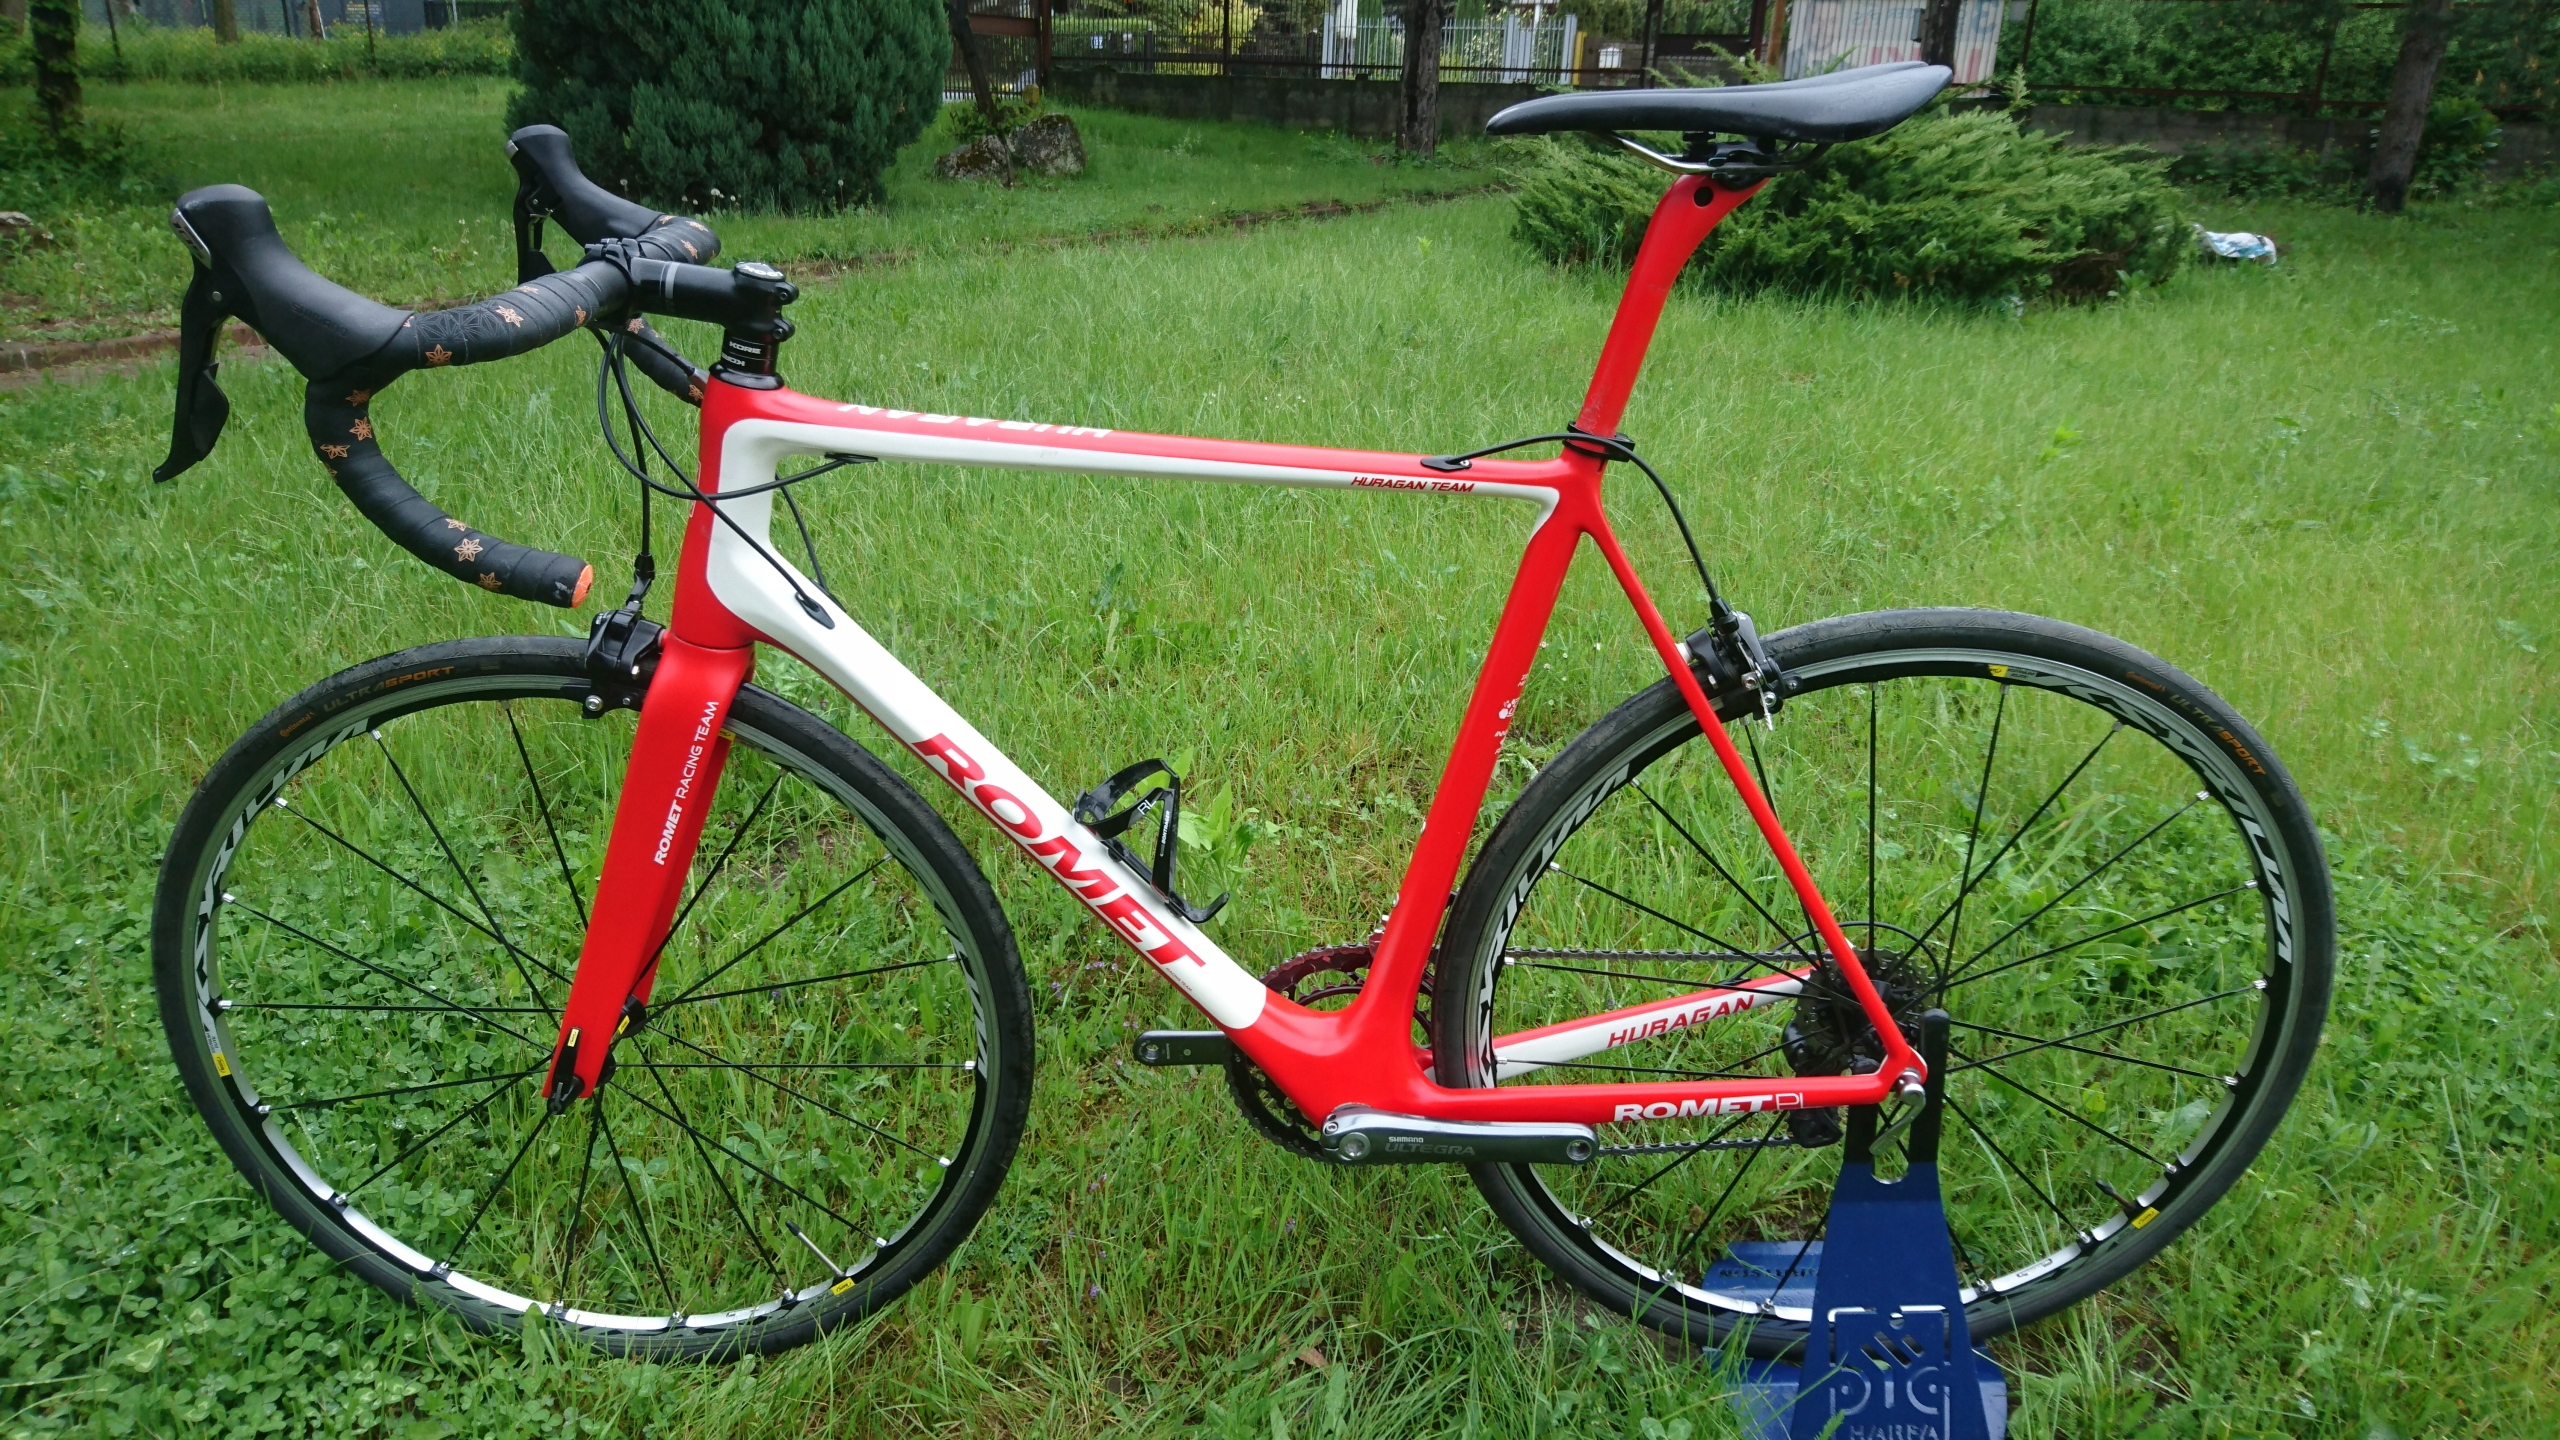 Rower Szosowy Romet Huragan 56 Ultegra 105 Team